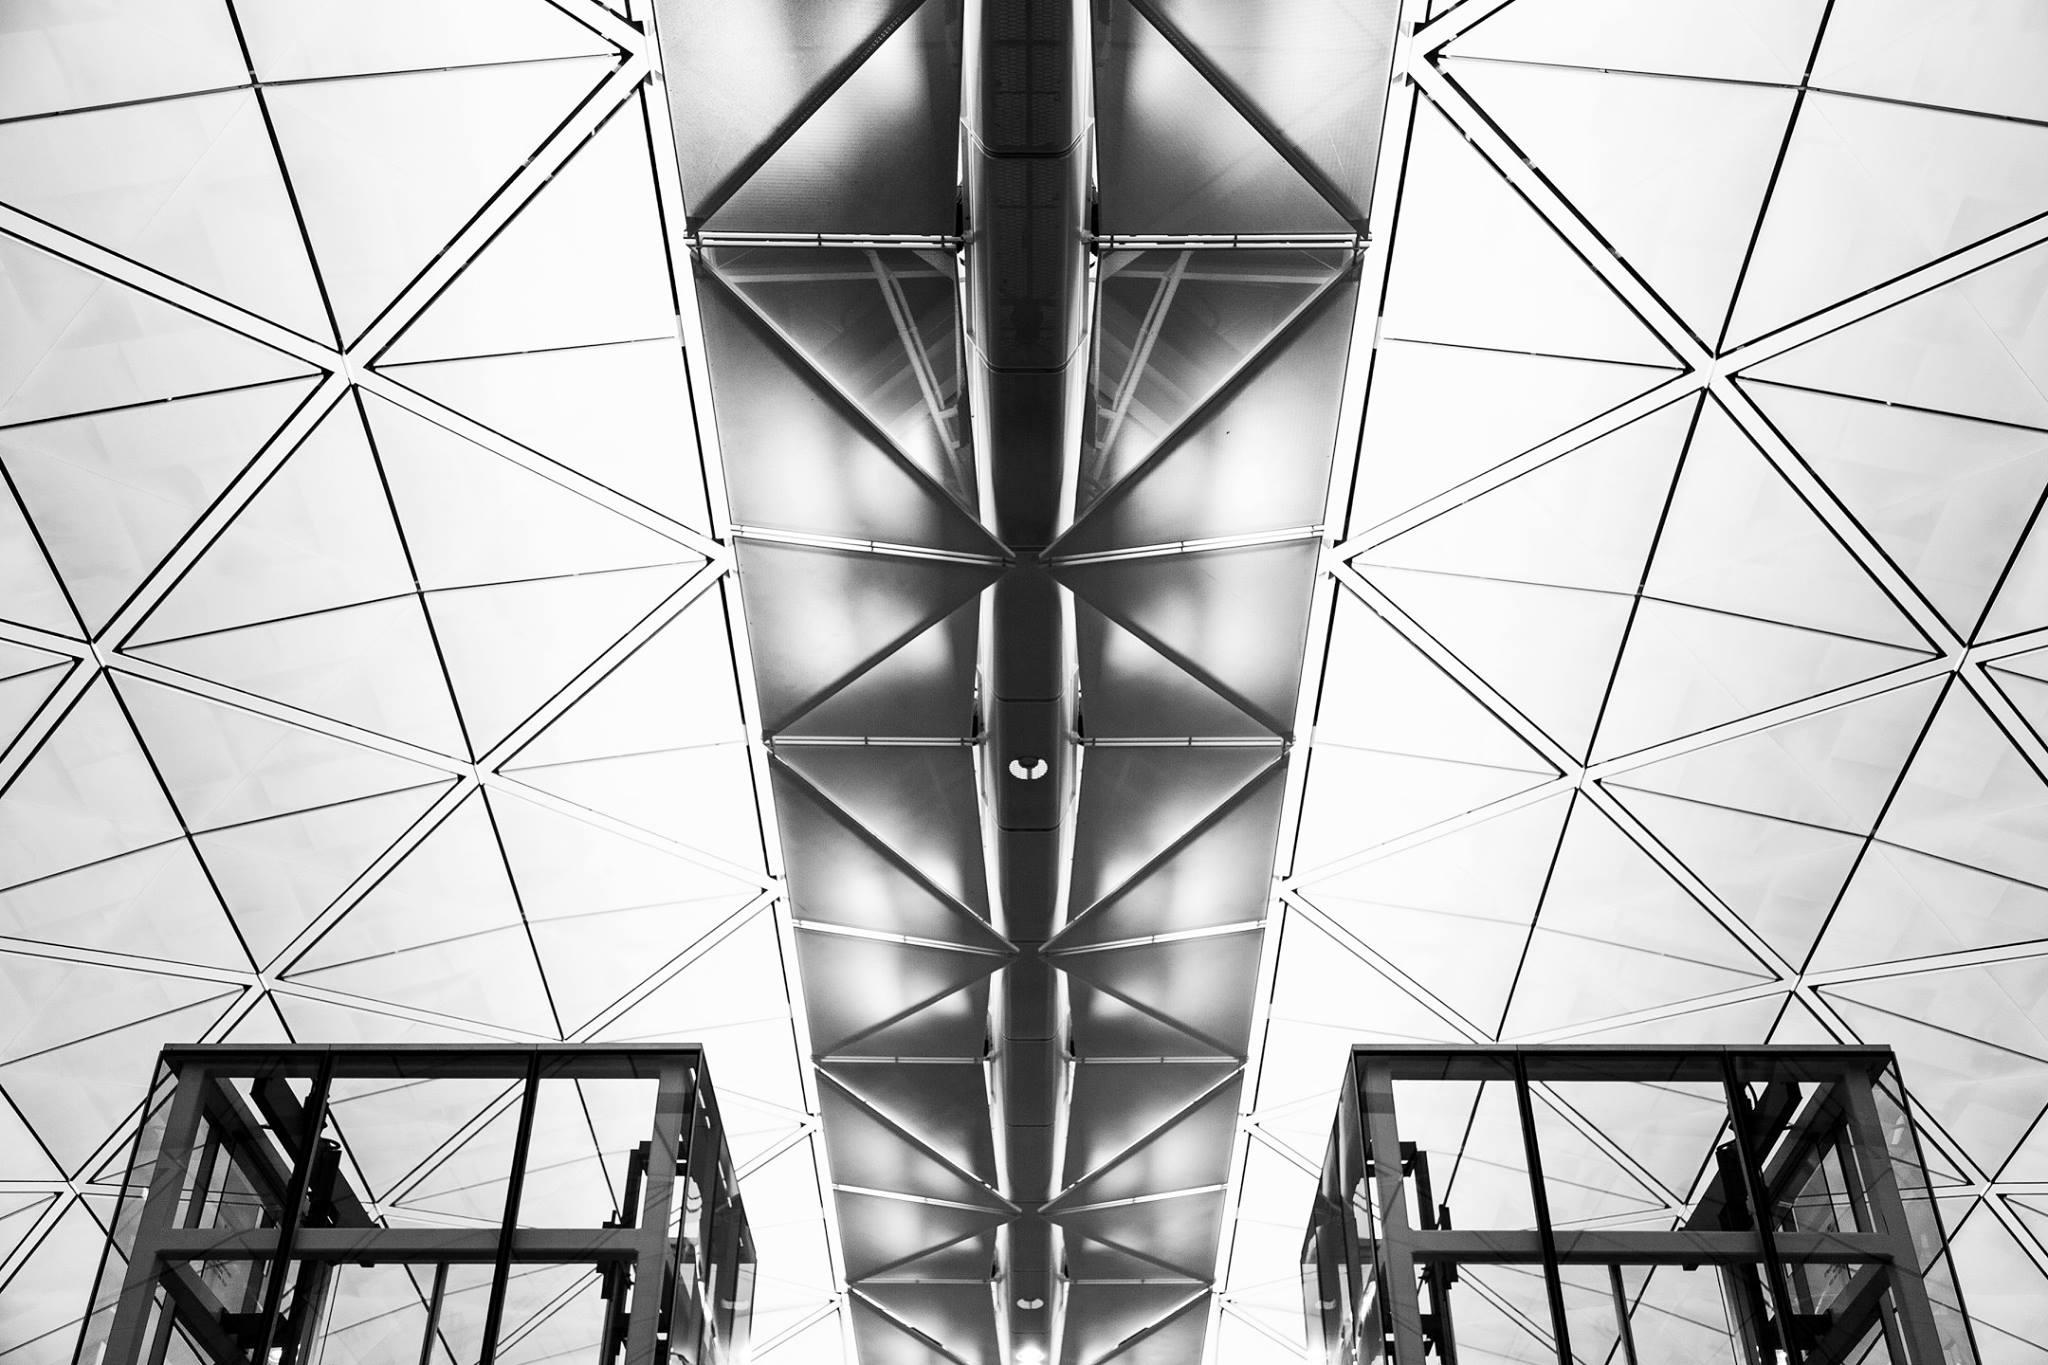 kevin-krautgartner-architecture-photography-11